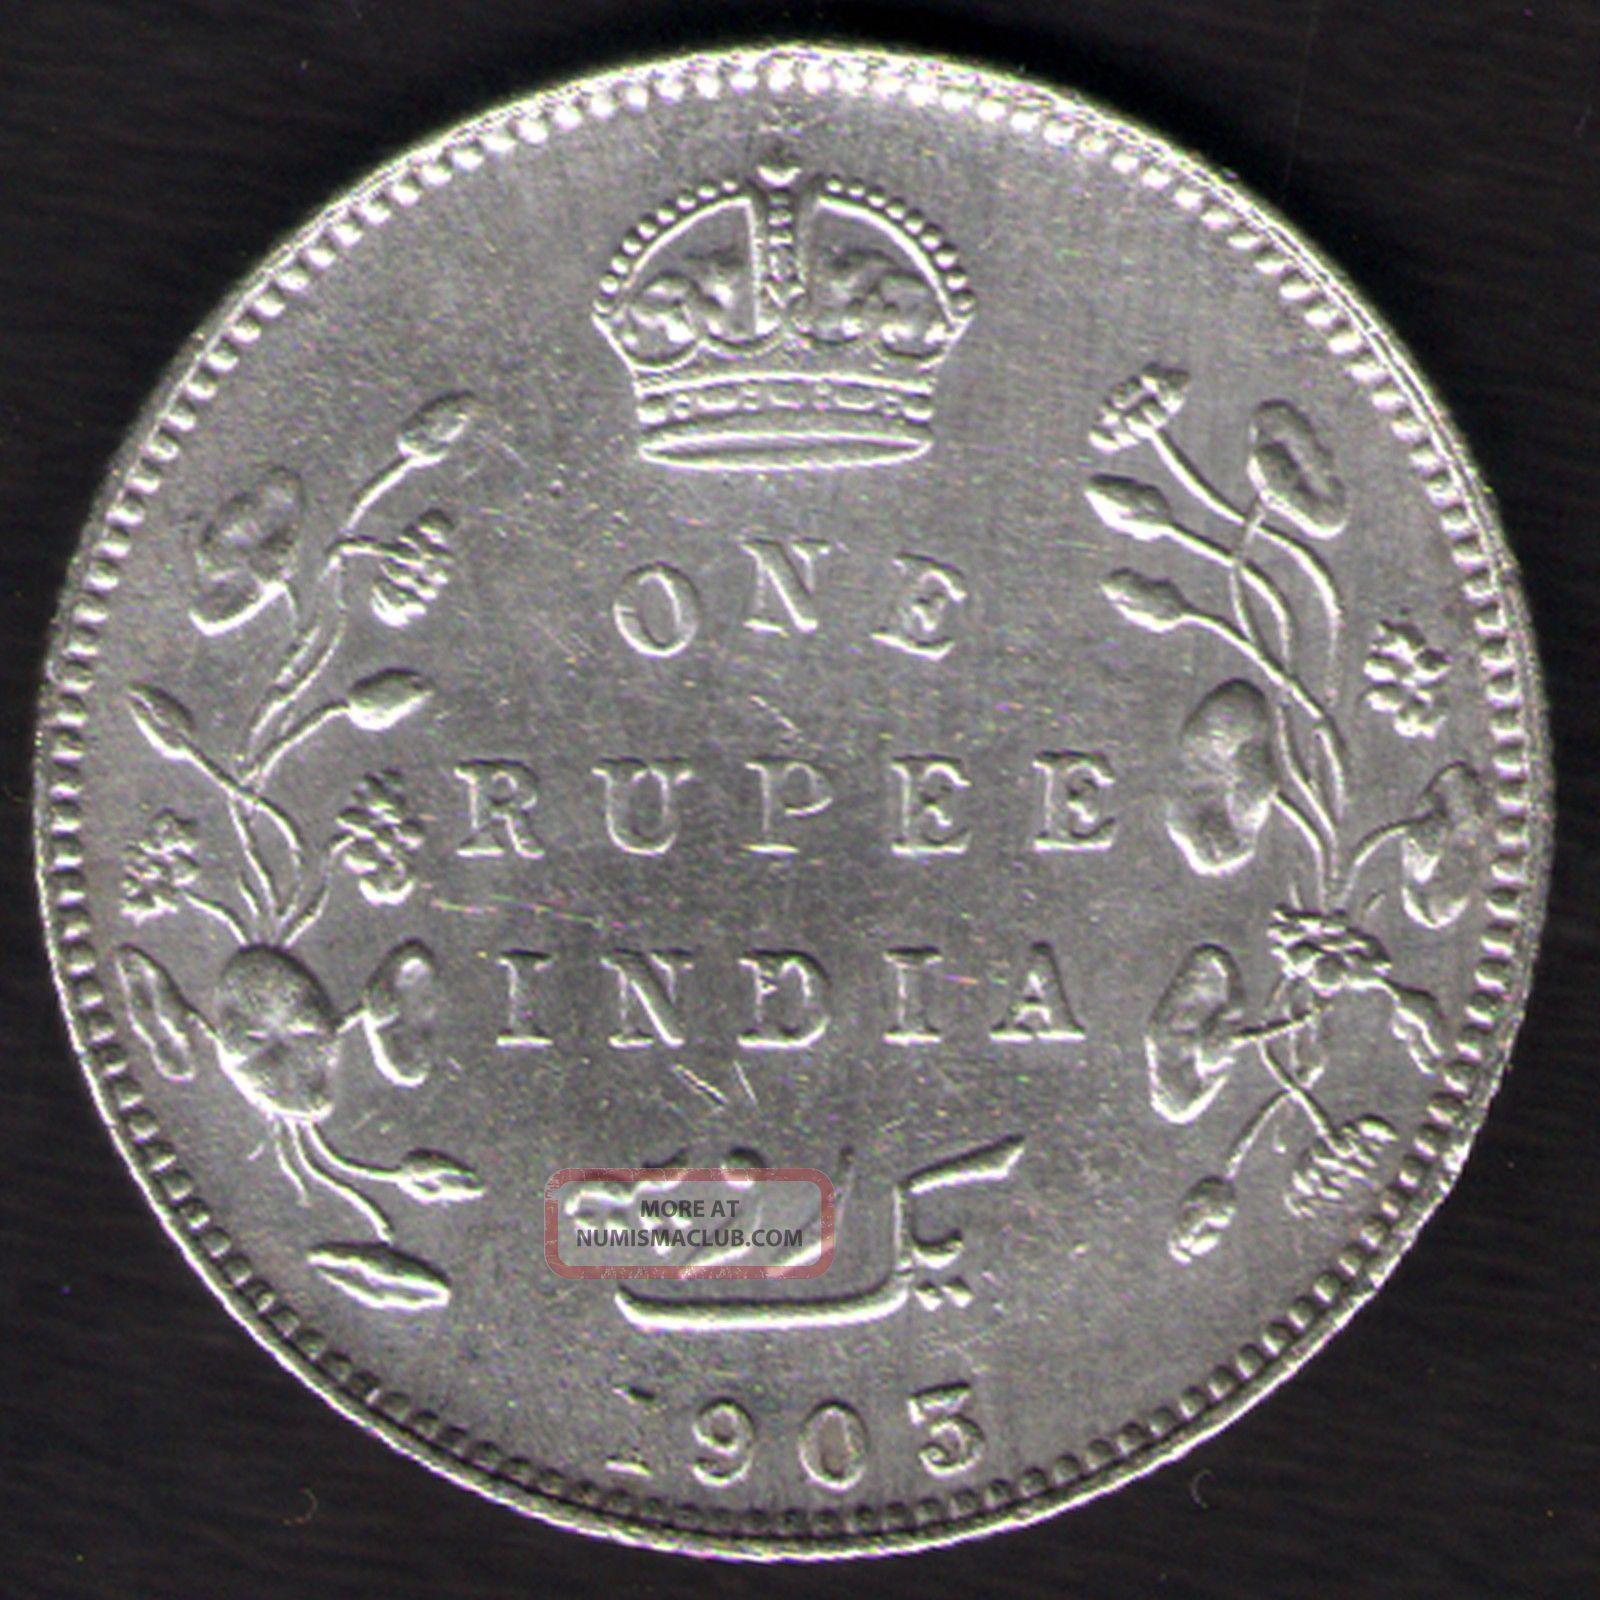 British India - 1905 - Edward Vii One Rupee Silver X - Fine Coin Ex - Rare Date British photo